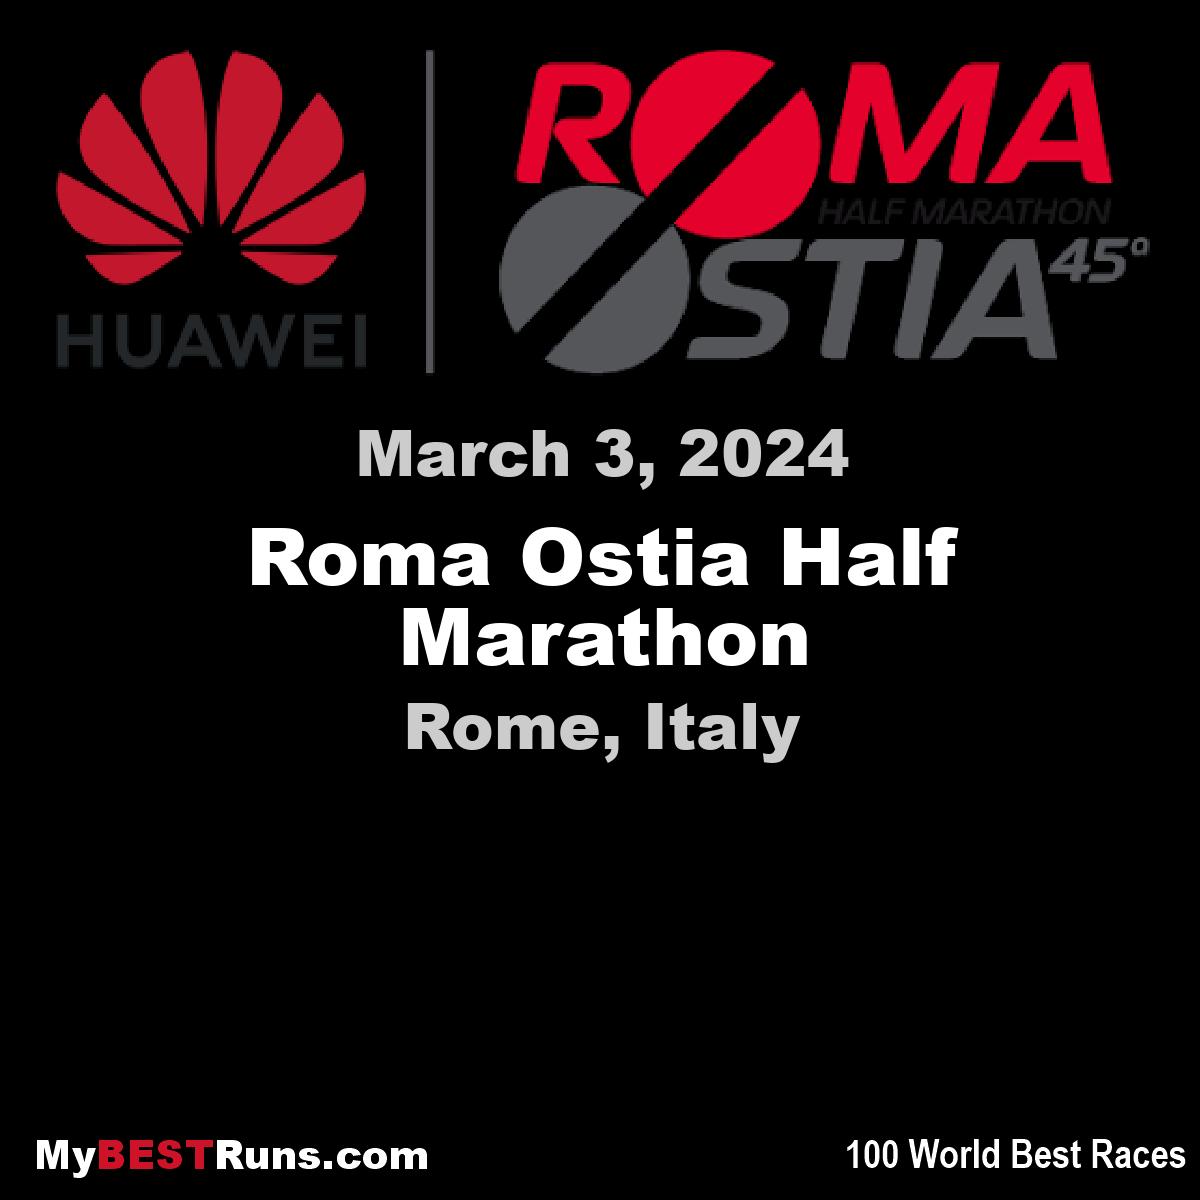 Roma Ostia Half Marathon